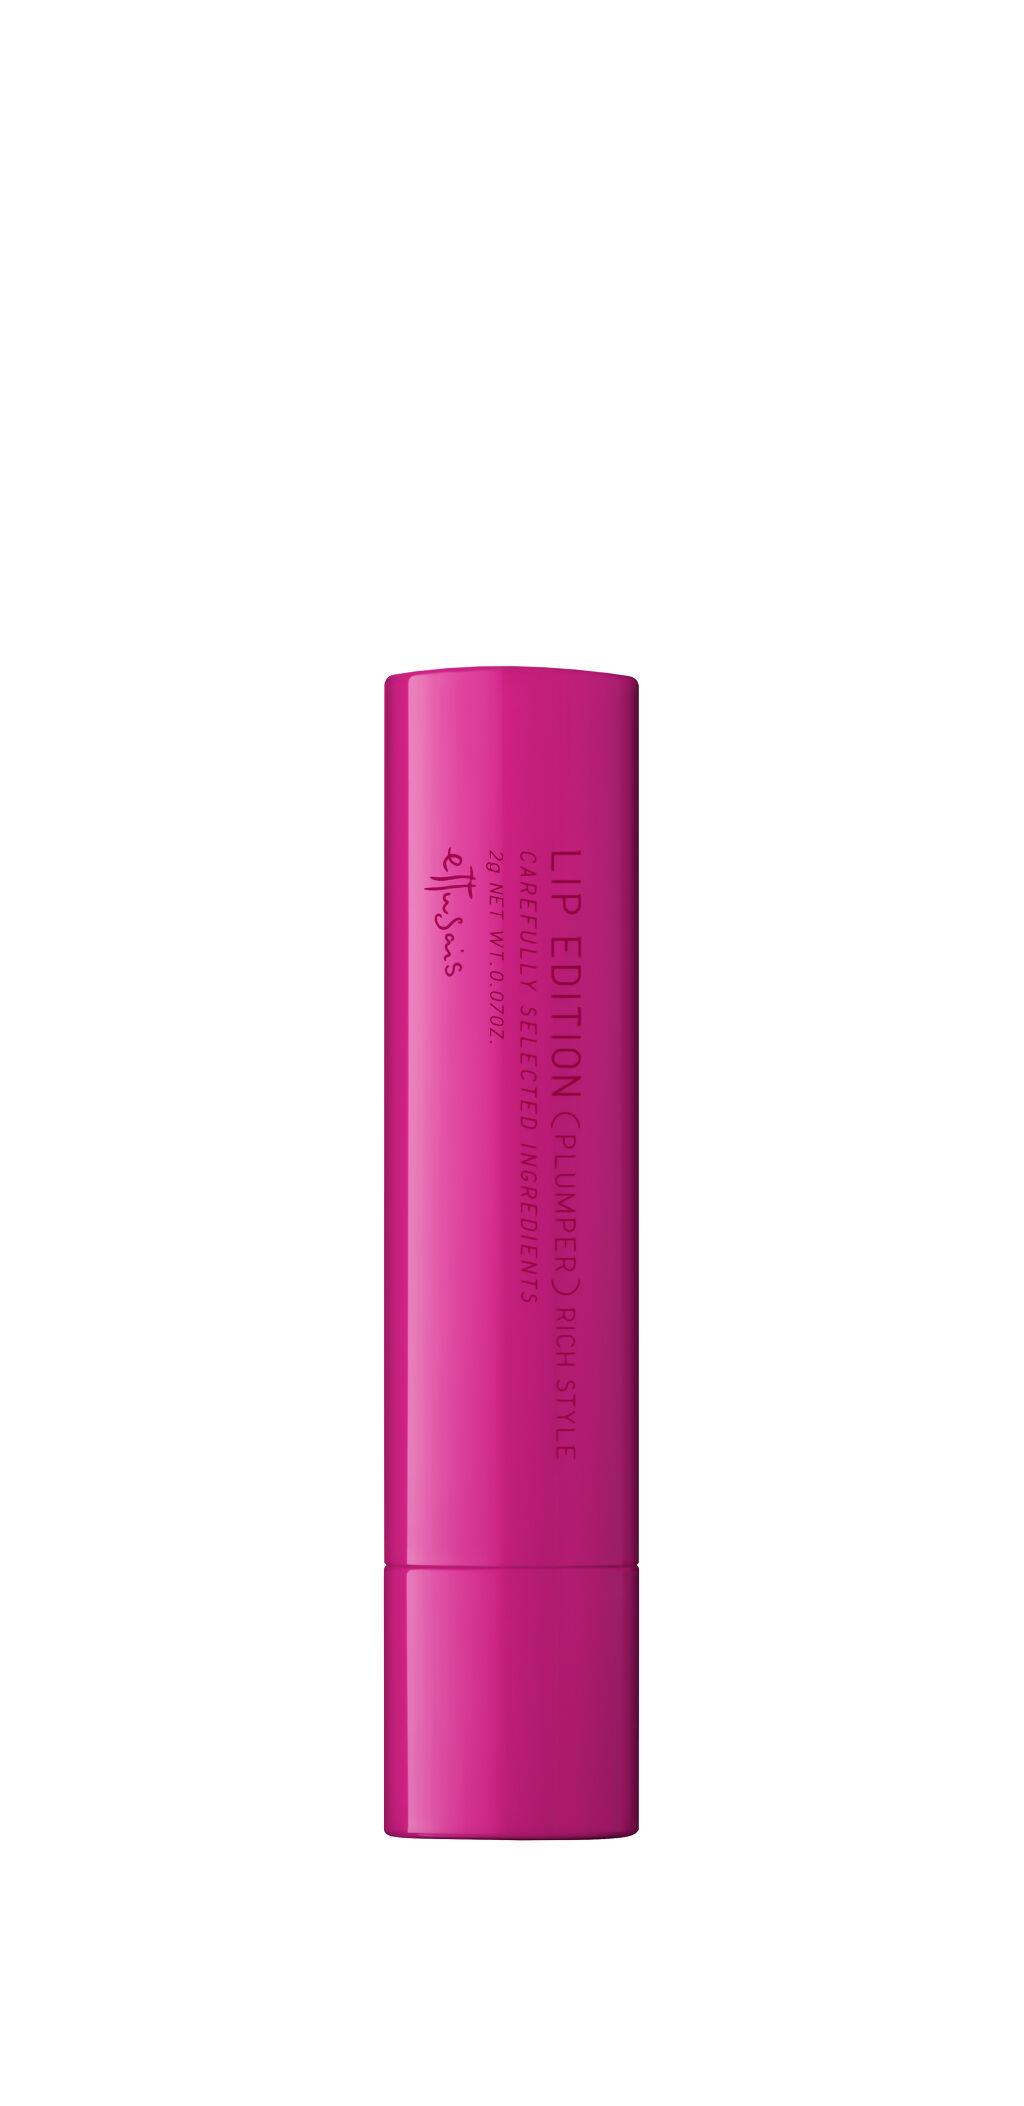 ettusais Lip Edition(Plumper)Rich Style2020日本冬季限定潤色護唇膏